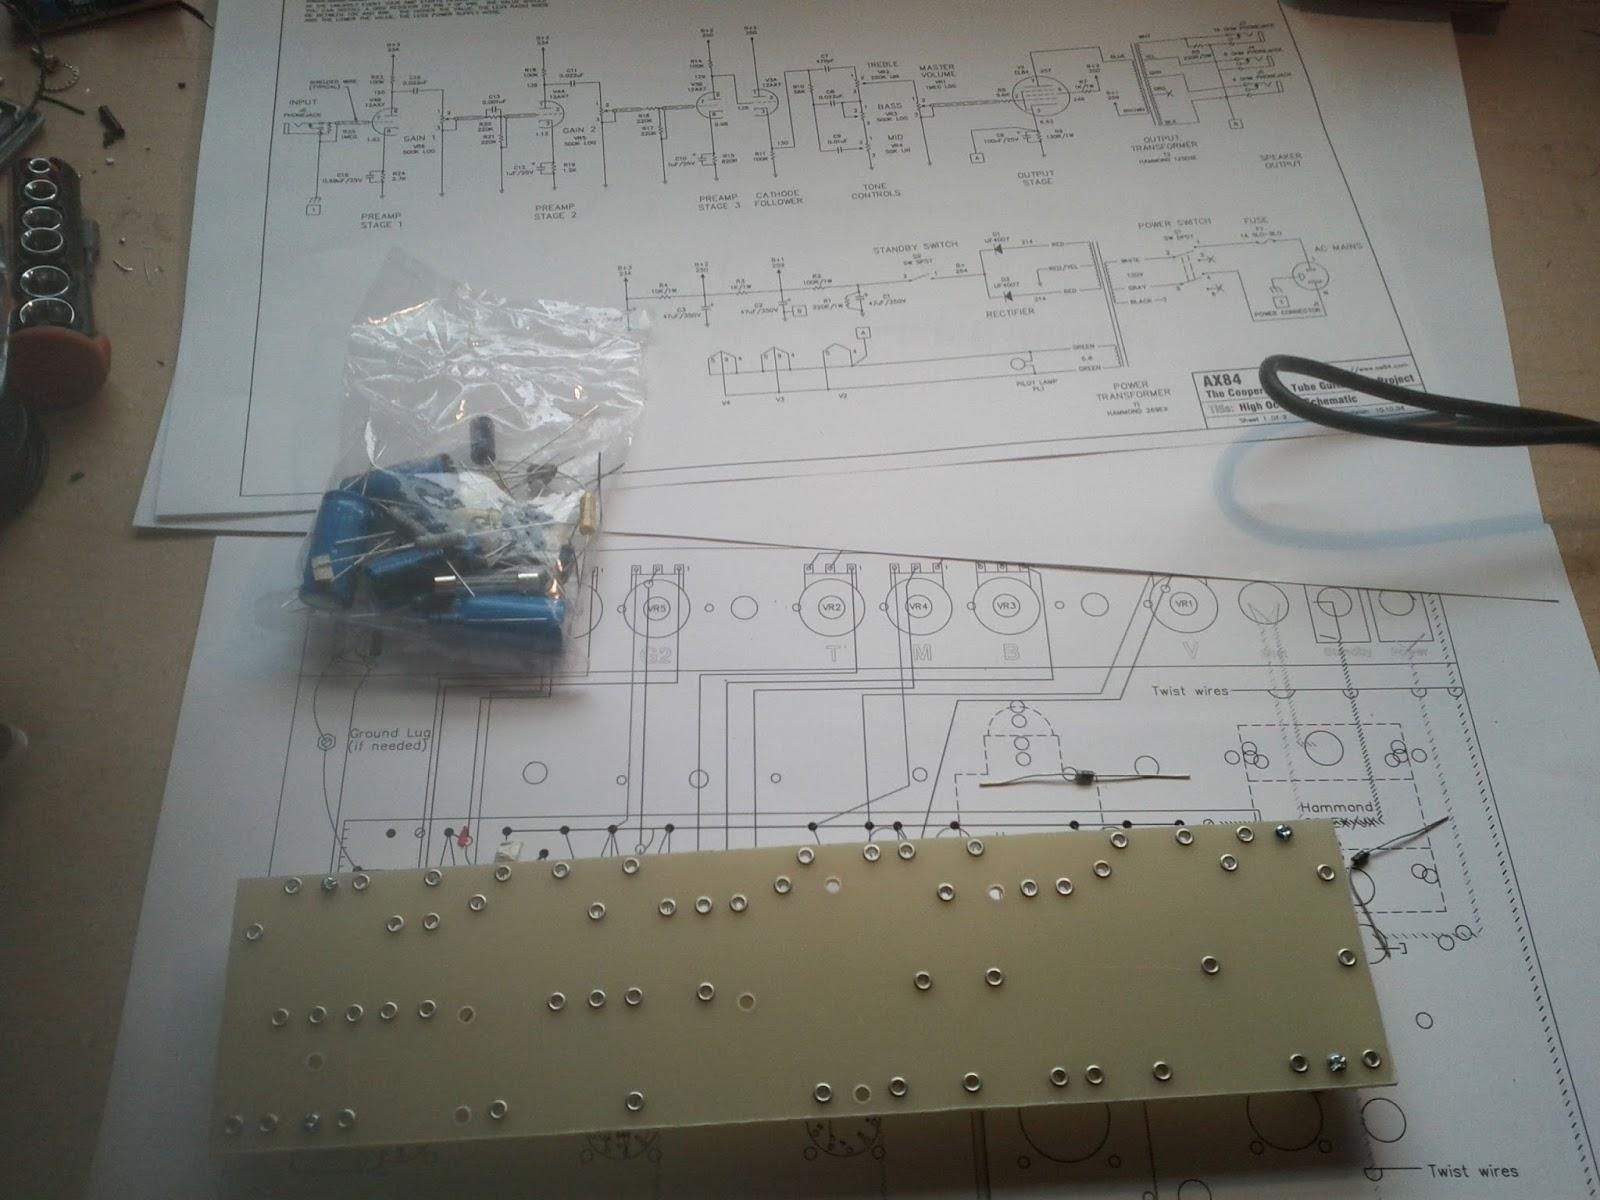 Soundular Electronics Ax84 Hi Octane Build Part 2 Circuit Board Eyelets Lonely Eyelet Parts Schematic Wiring Diagram